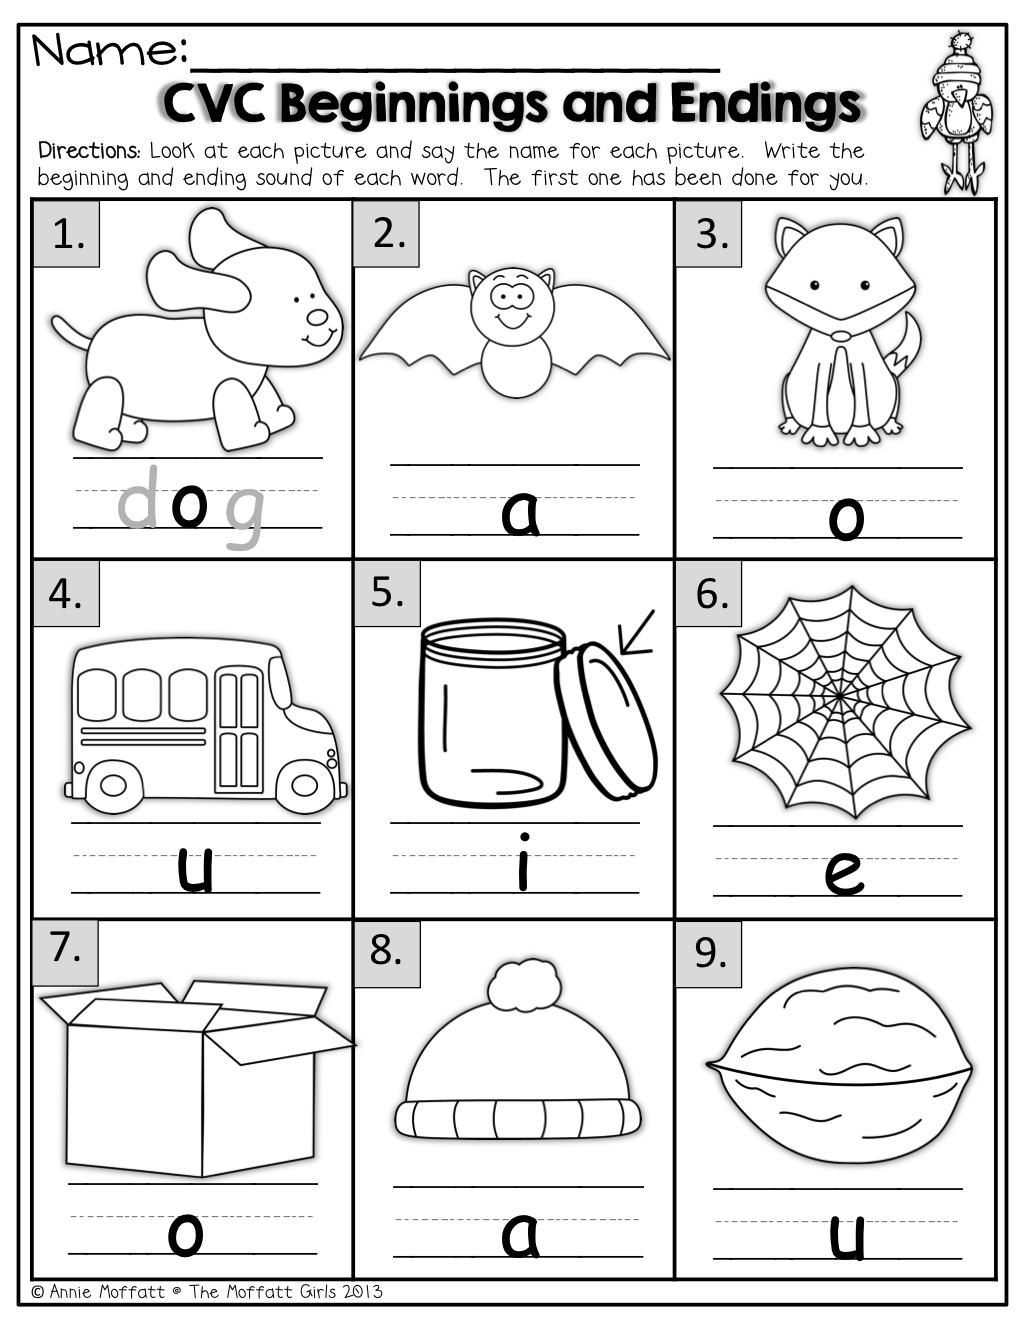 medium resolution of Pin by The Moffatt Girls on KinderLand Collaborative   Kindergarten  language arts